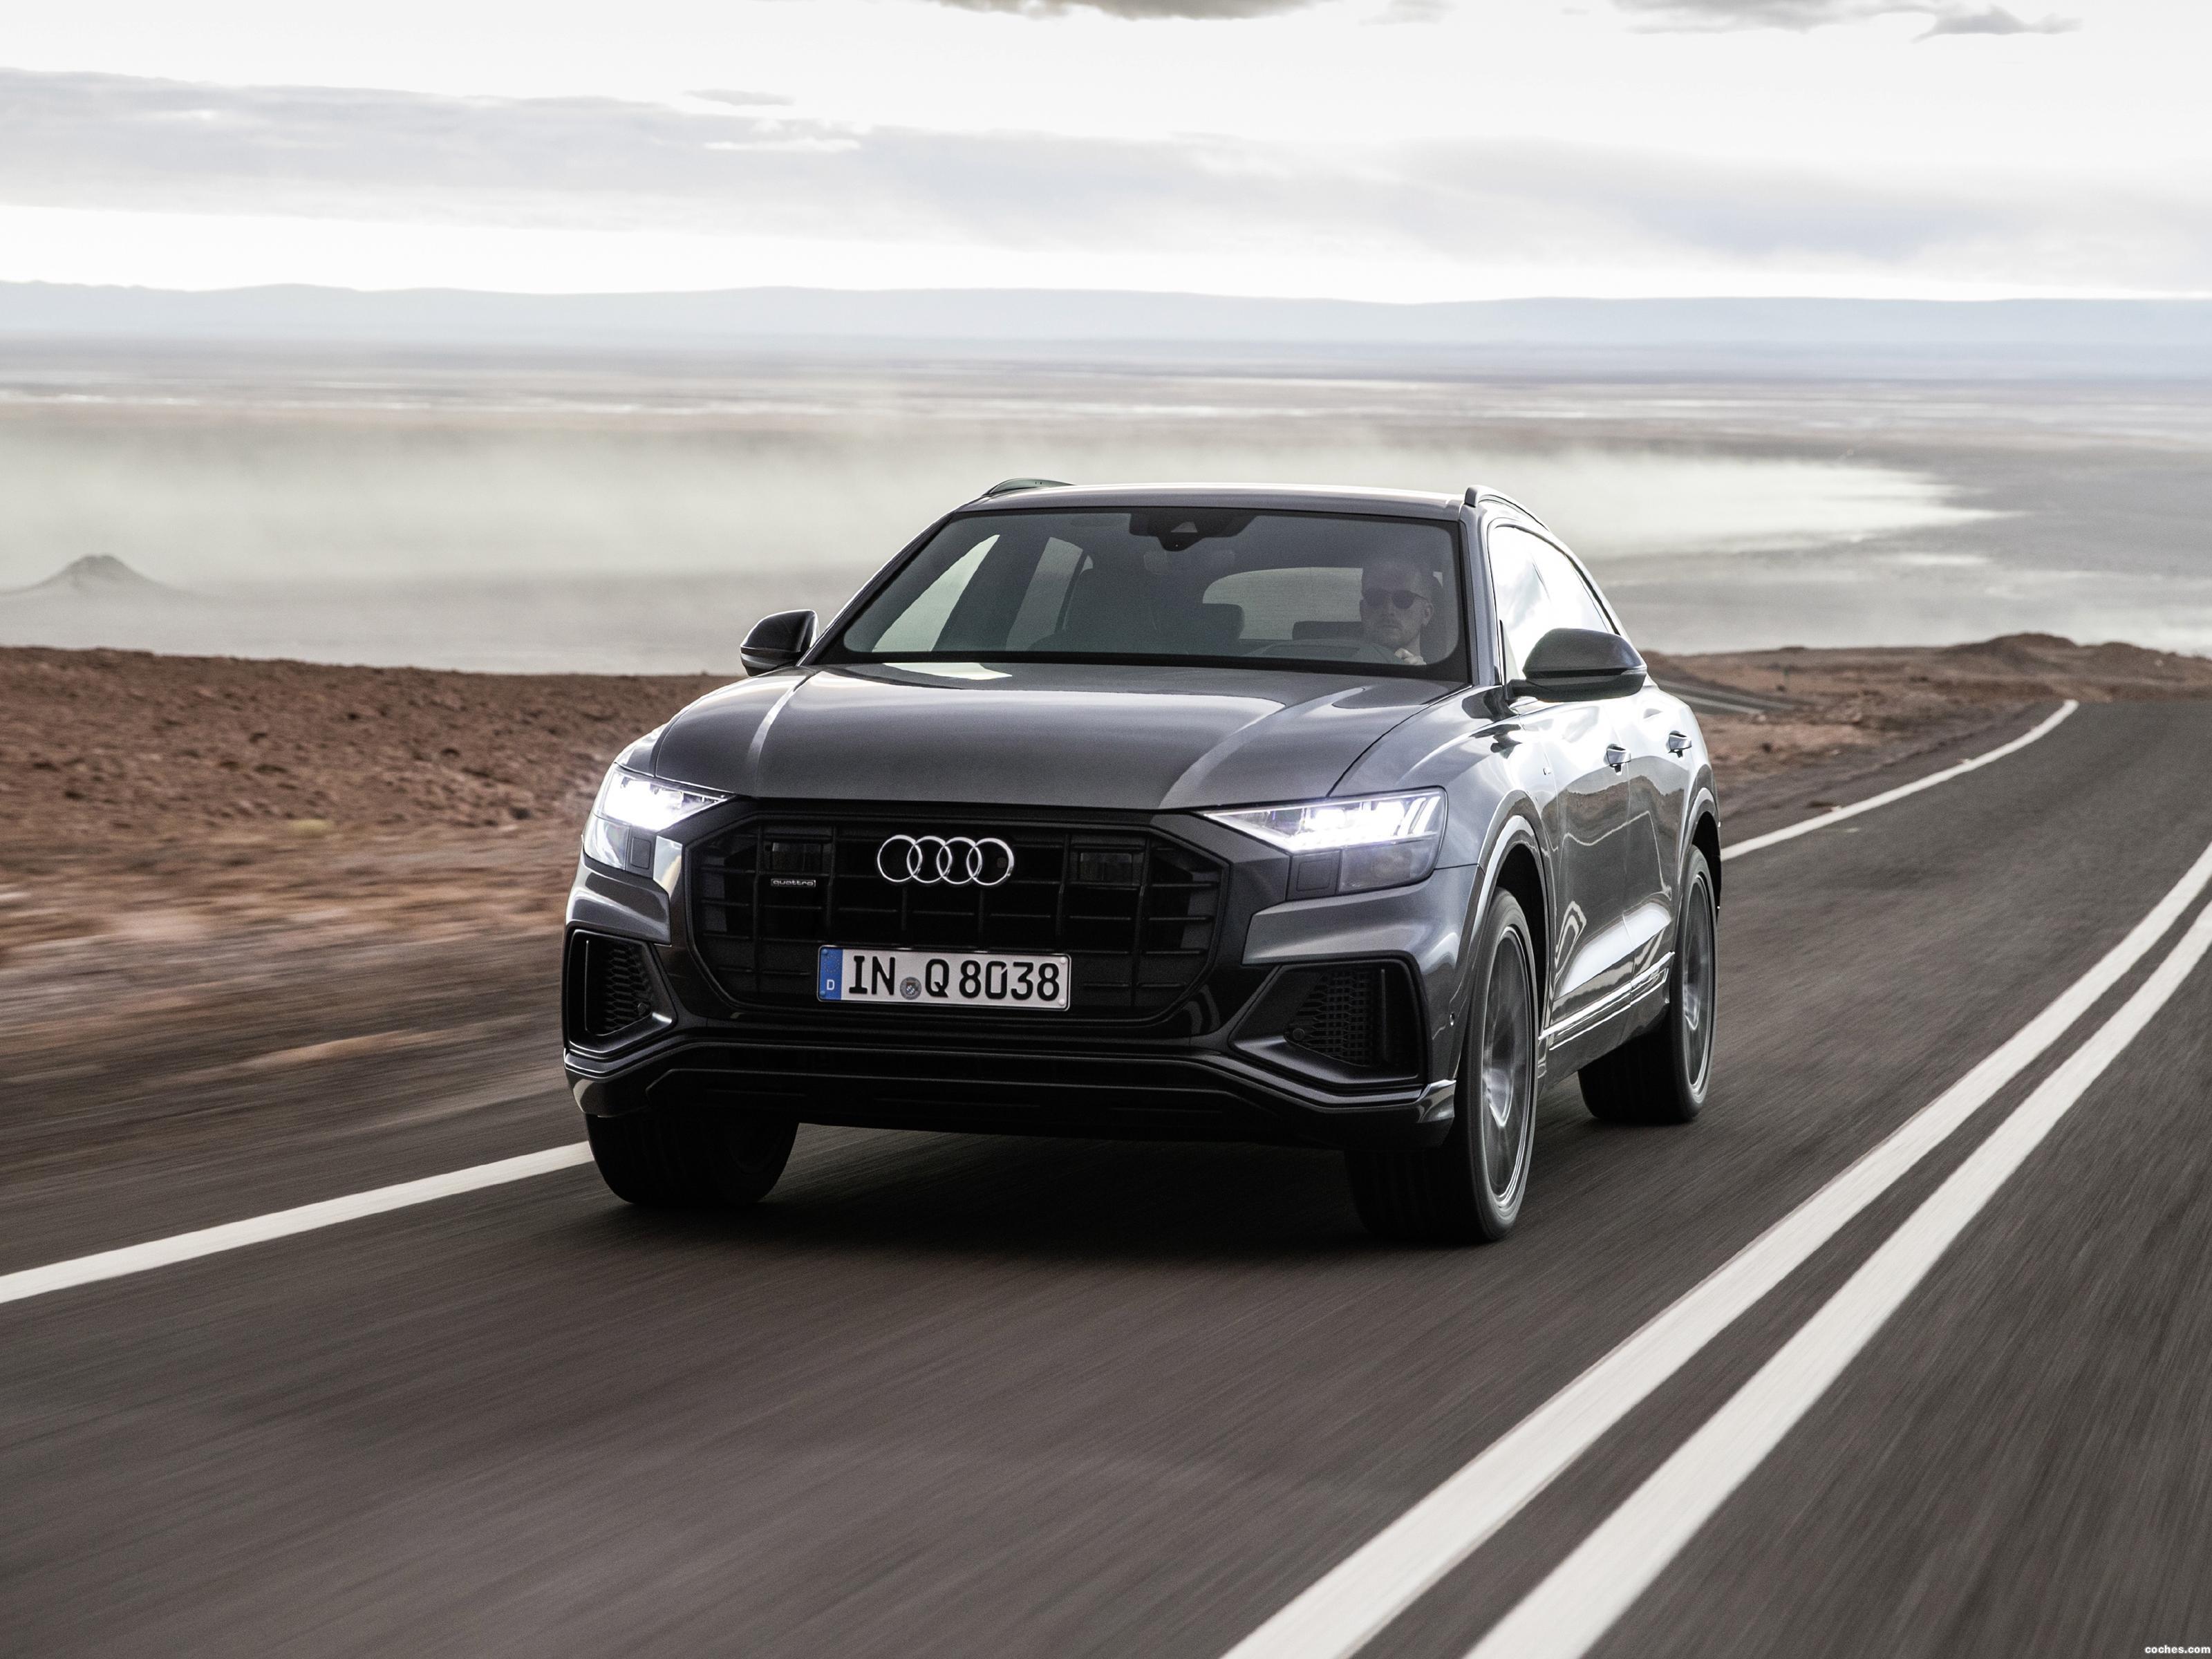 Foto 0 de Audi Q8 55 TFSI Quattro S Line 2018